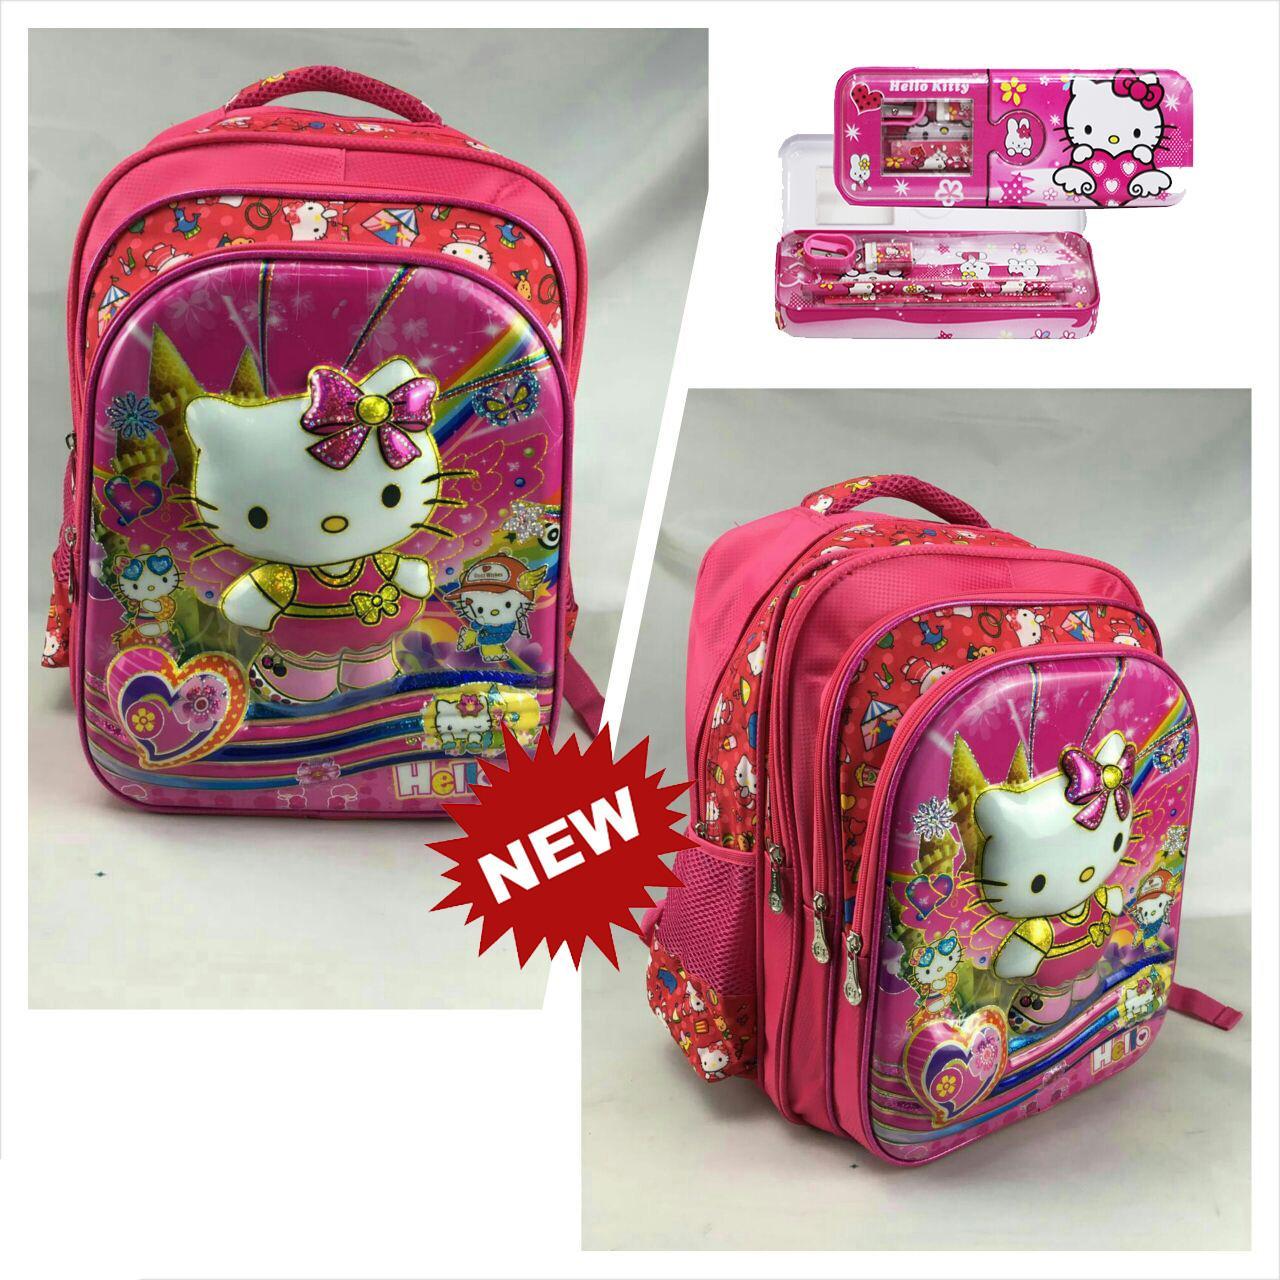 Onlan Tas Ransel Anak Sekolah SD Karakter Anak Perempuan Motif 6D Timbul Import 4 Kantung Besar + Kotak Pensil - Pink